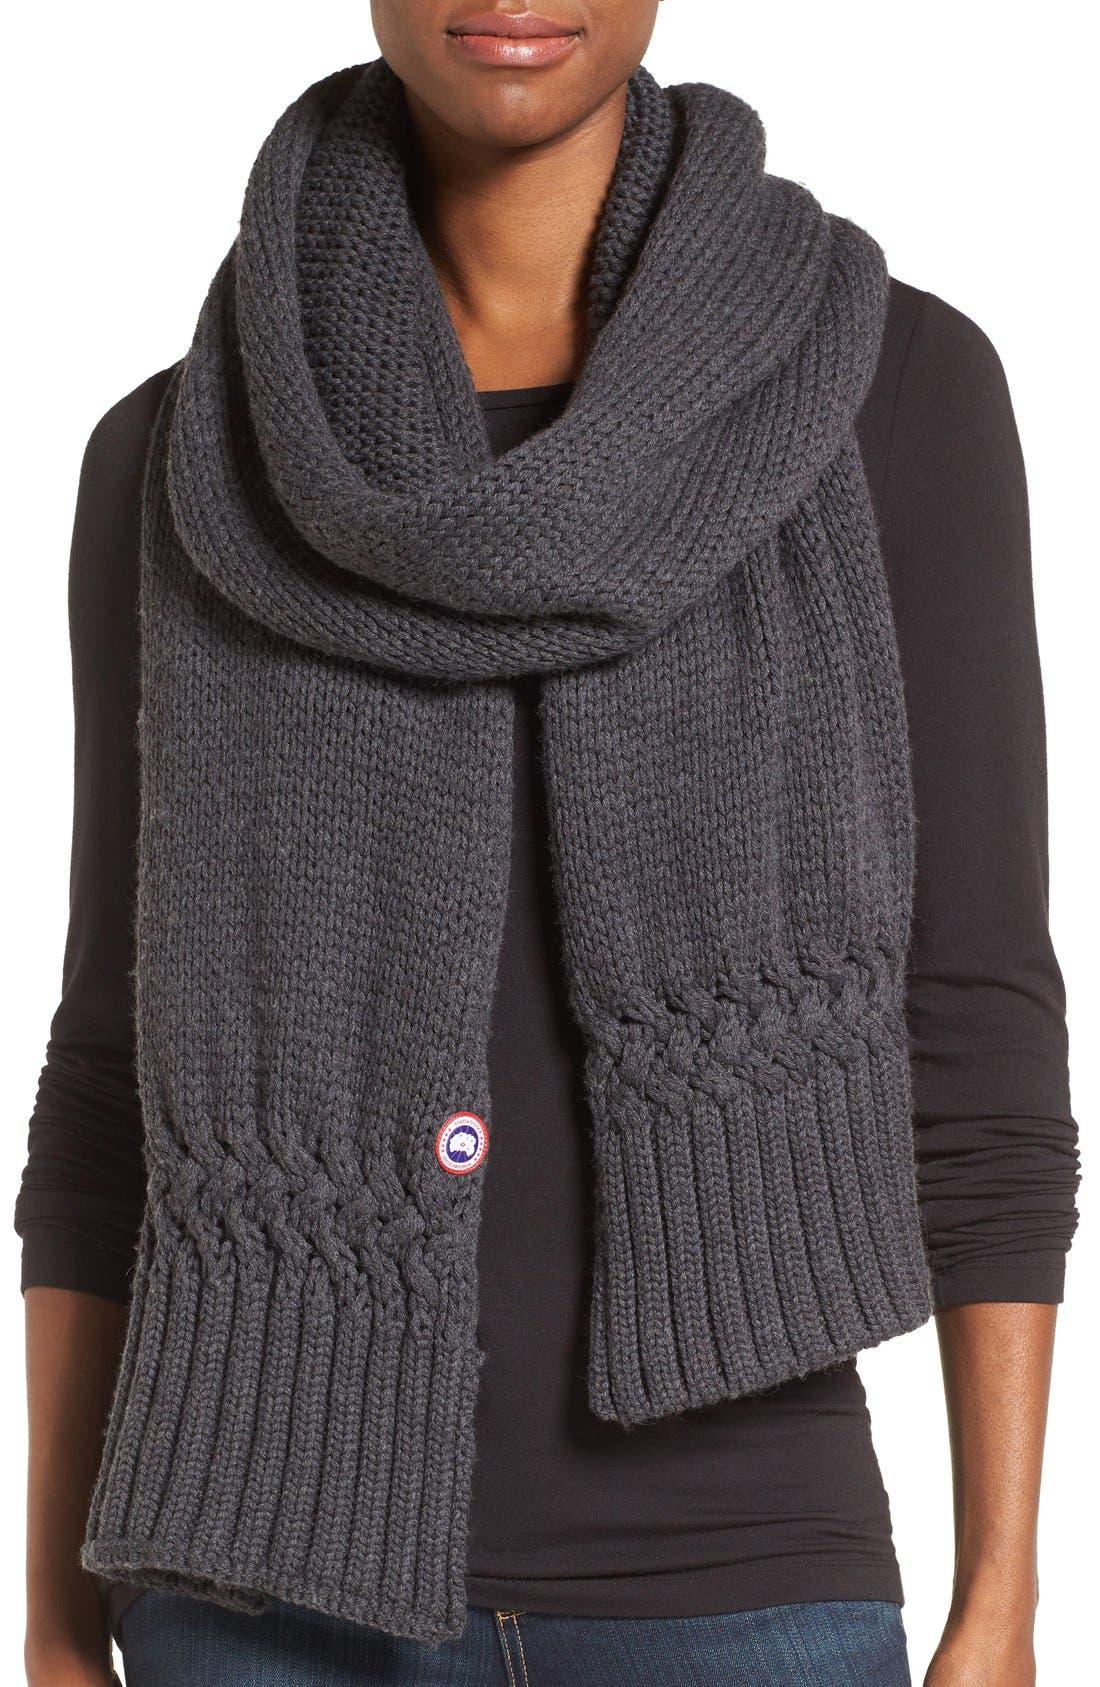 Canada Goose Knit Merino Wool Scarf